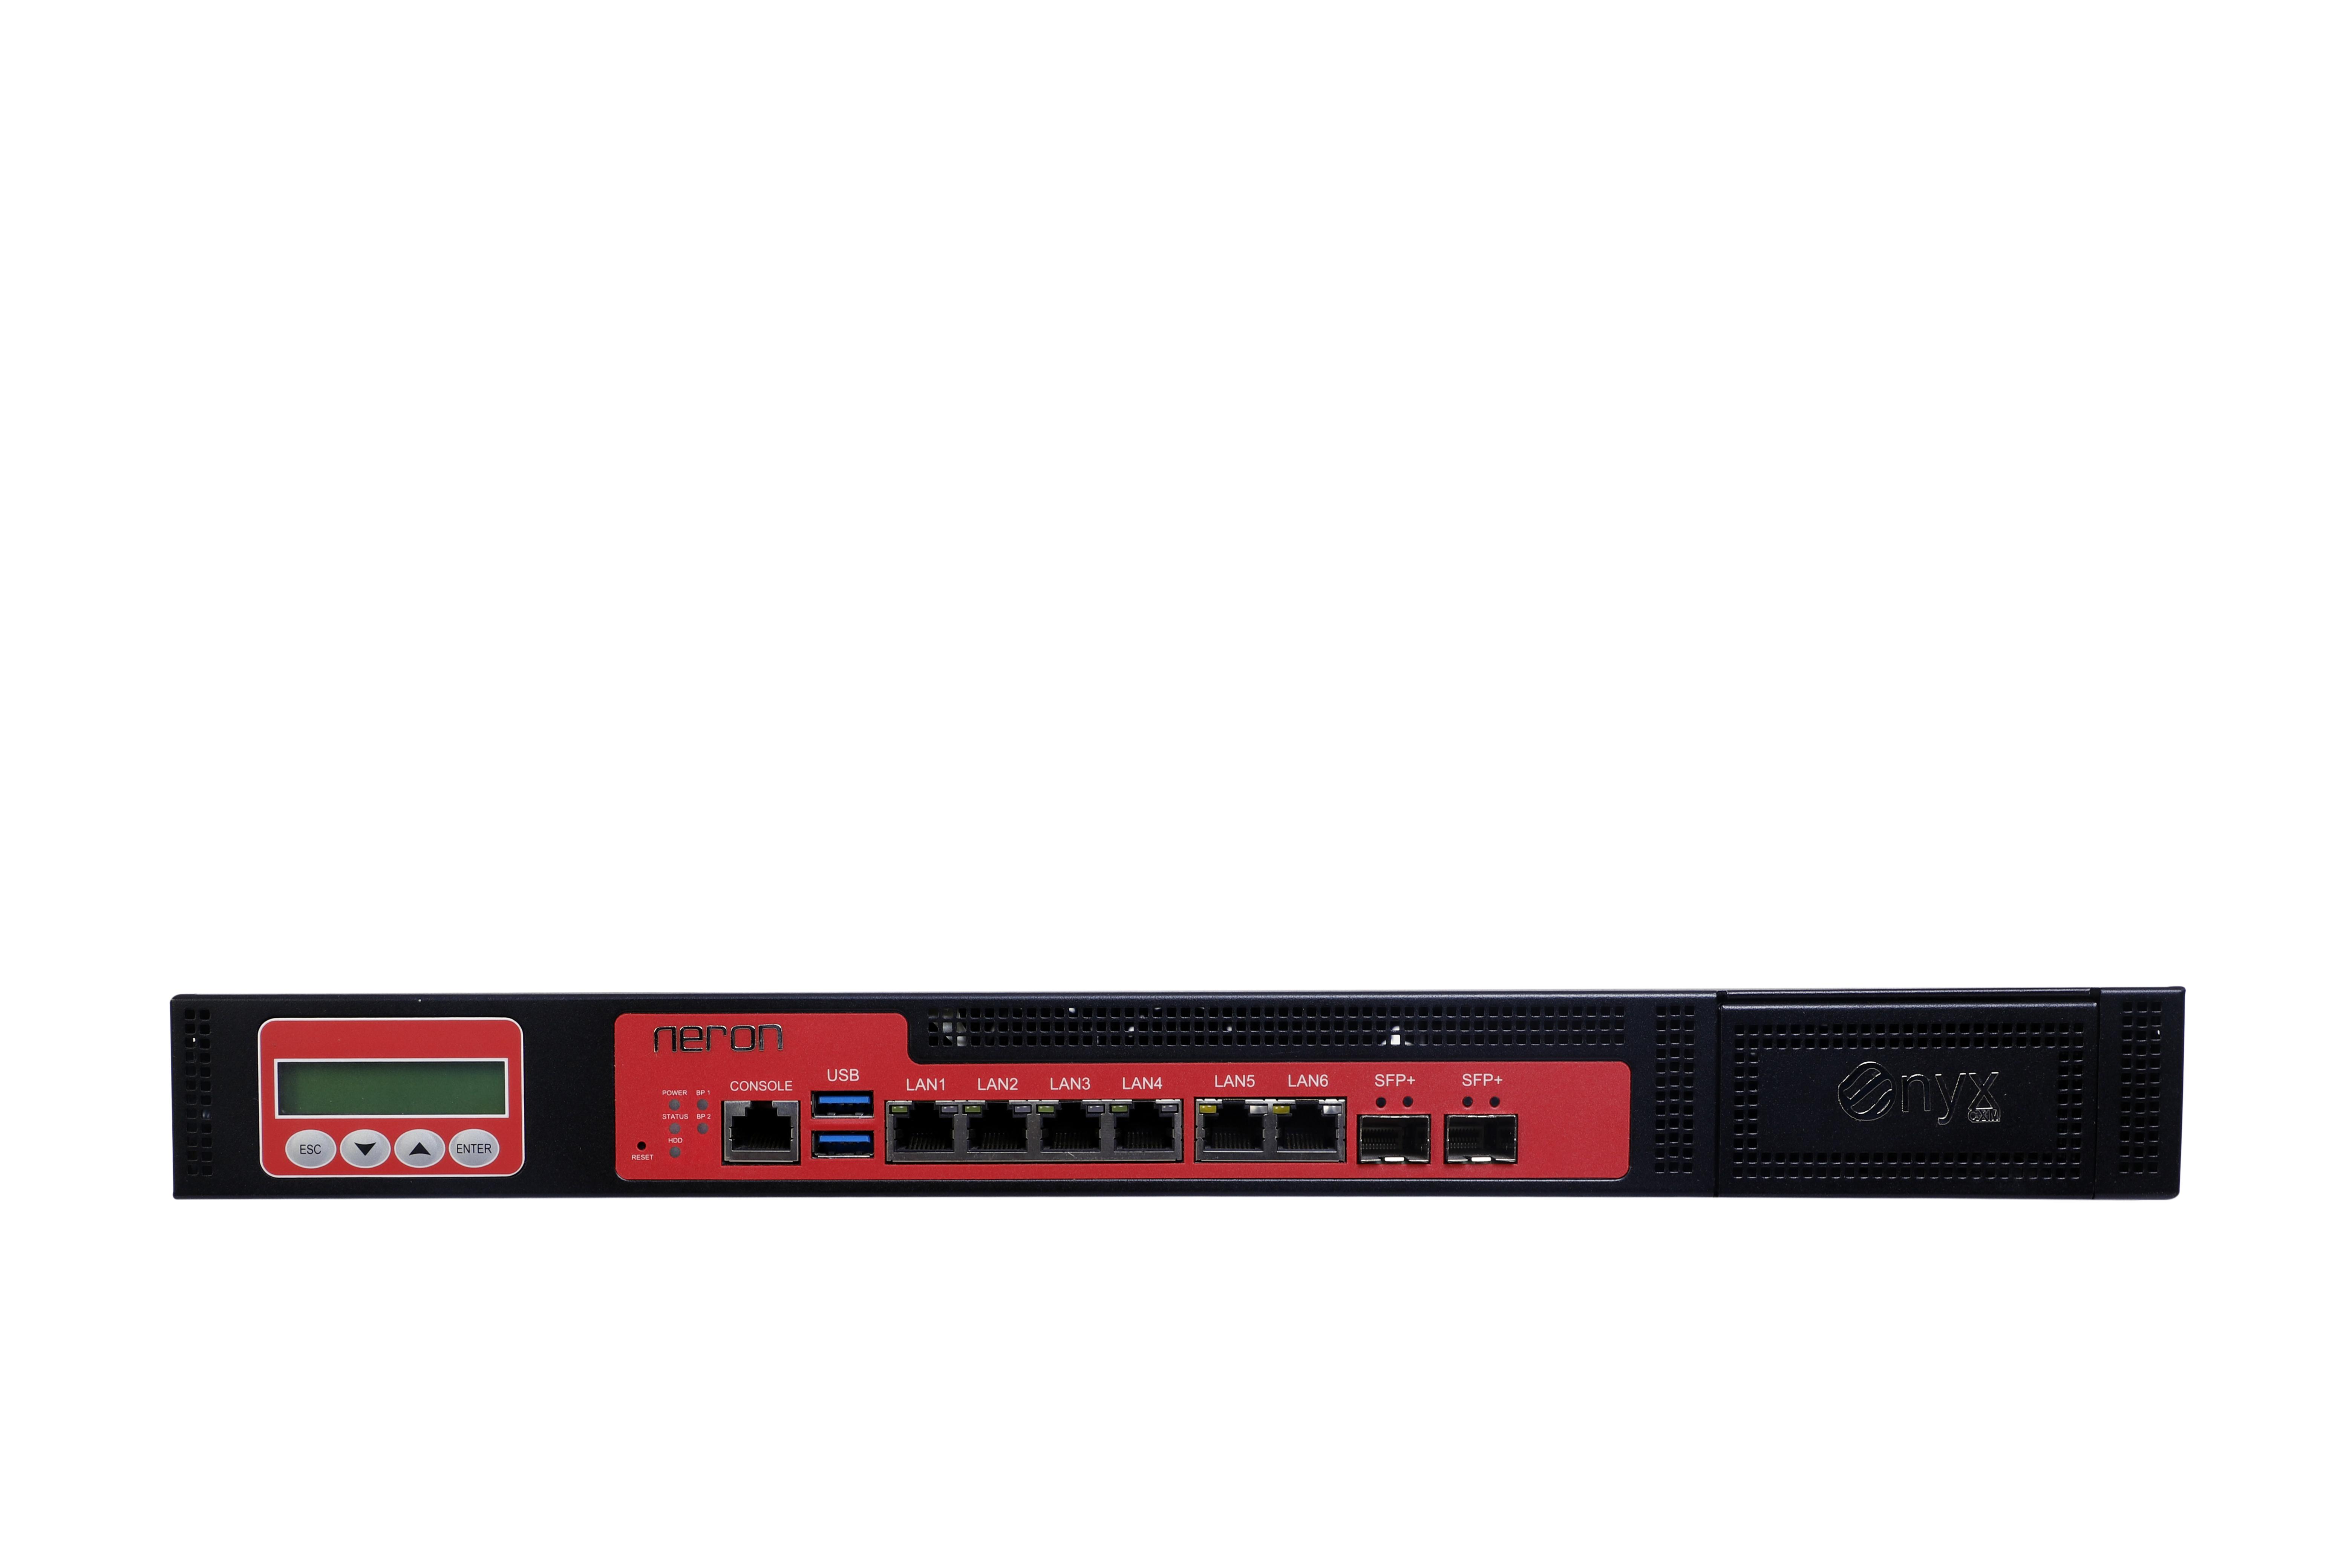 Neron- Onyx CXM IPPBX System